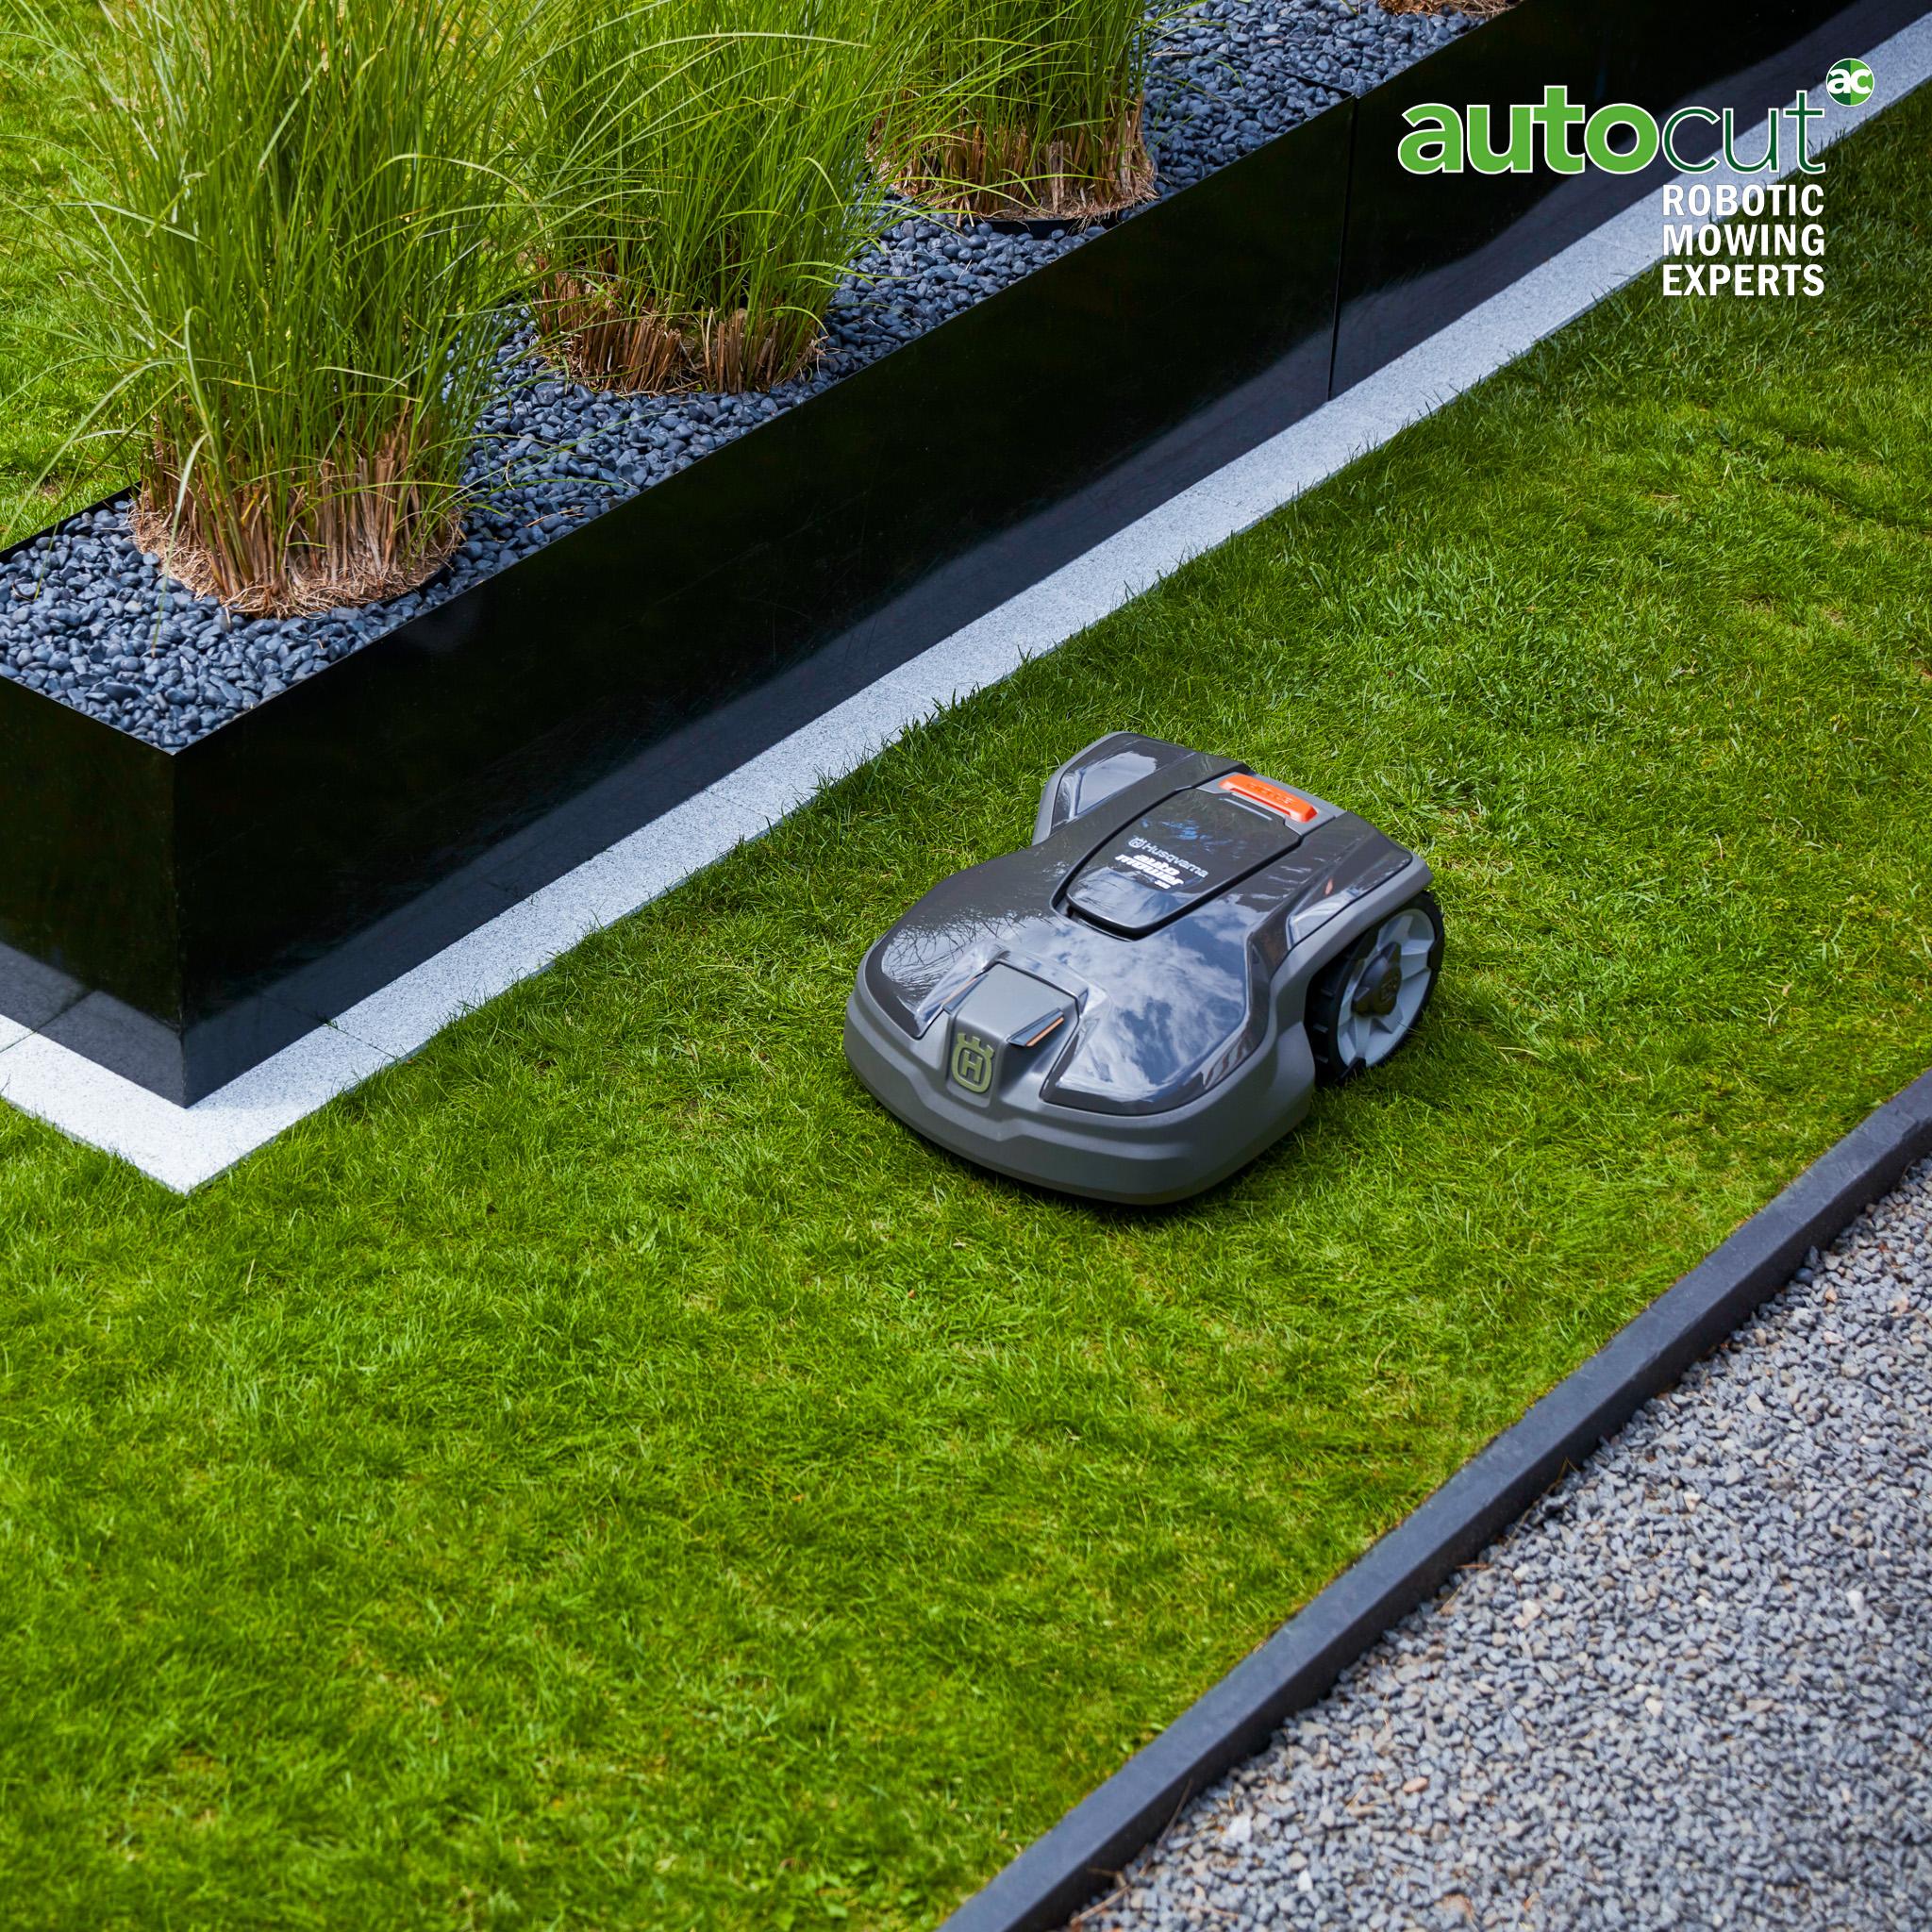 Meet the Mower: Automower® 305